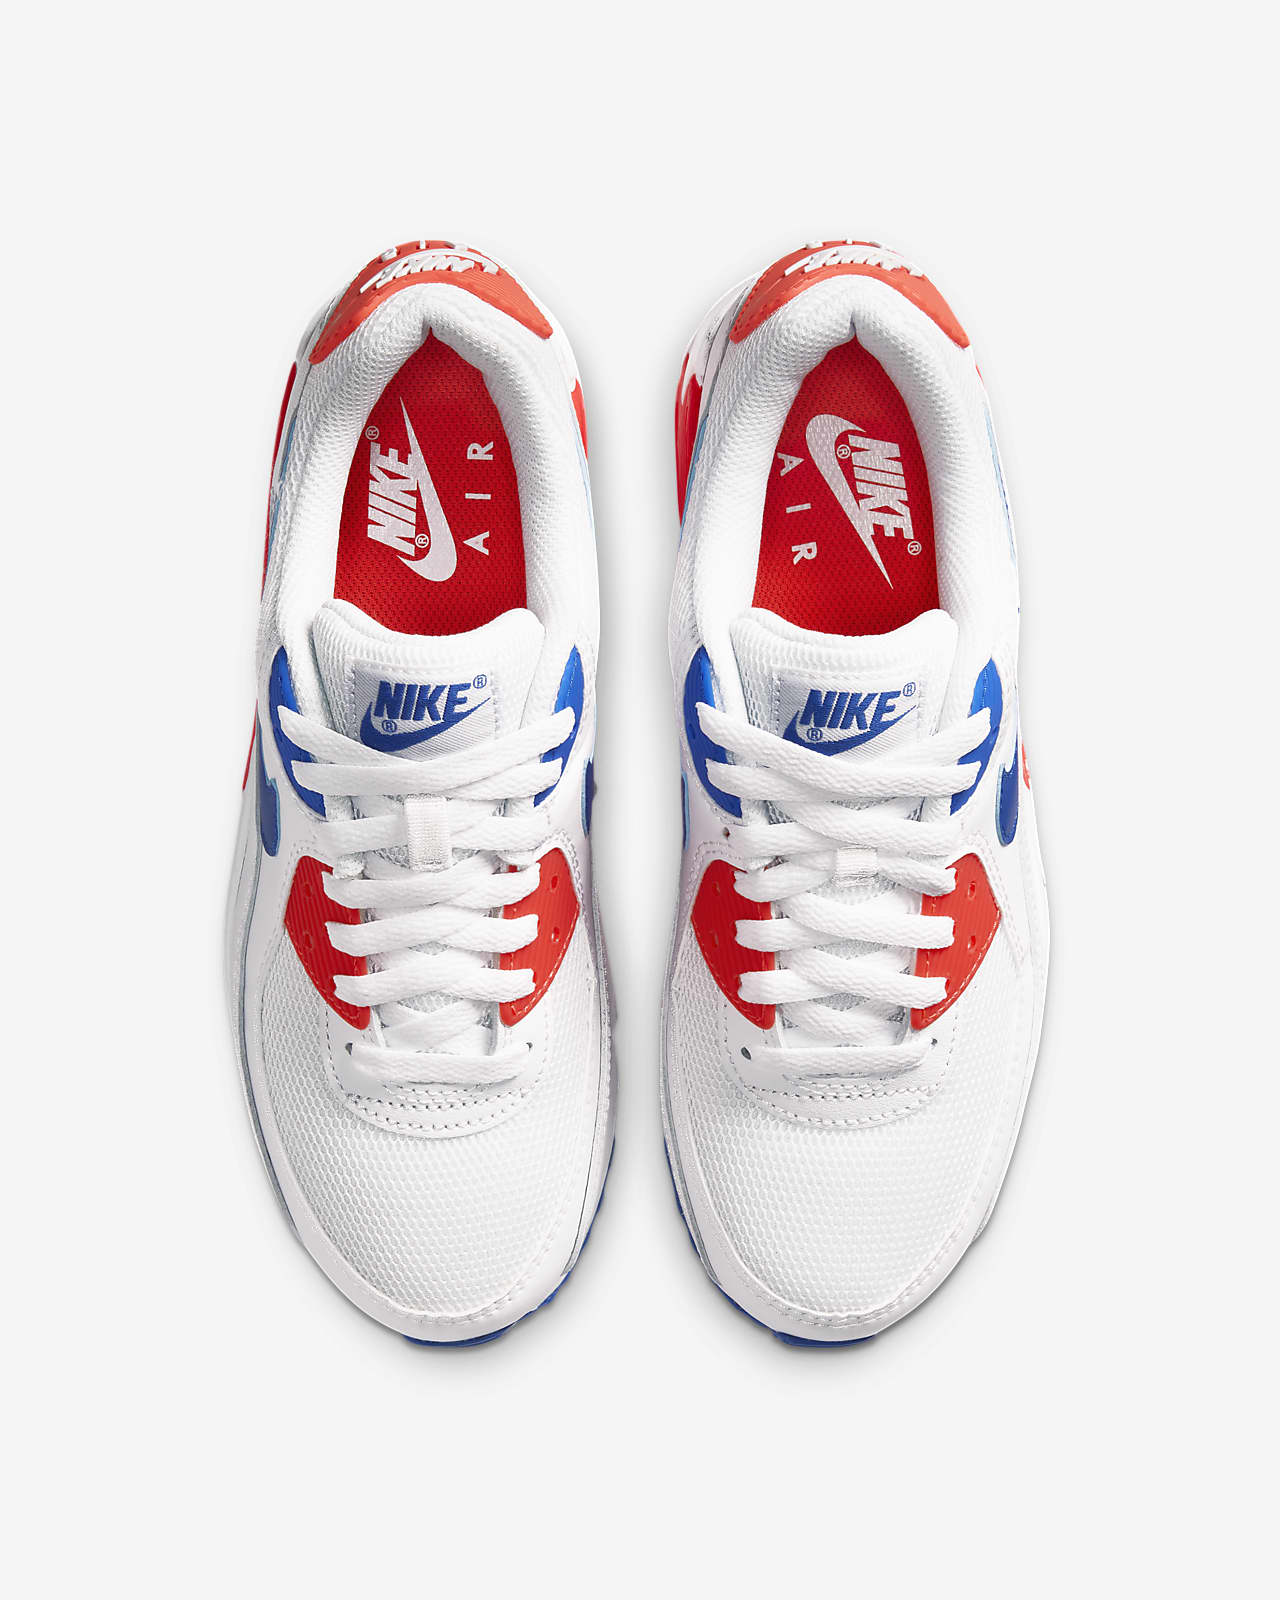 baskets nike air max 90 chaussures de running pour homme bleu